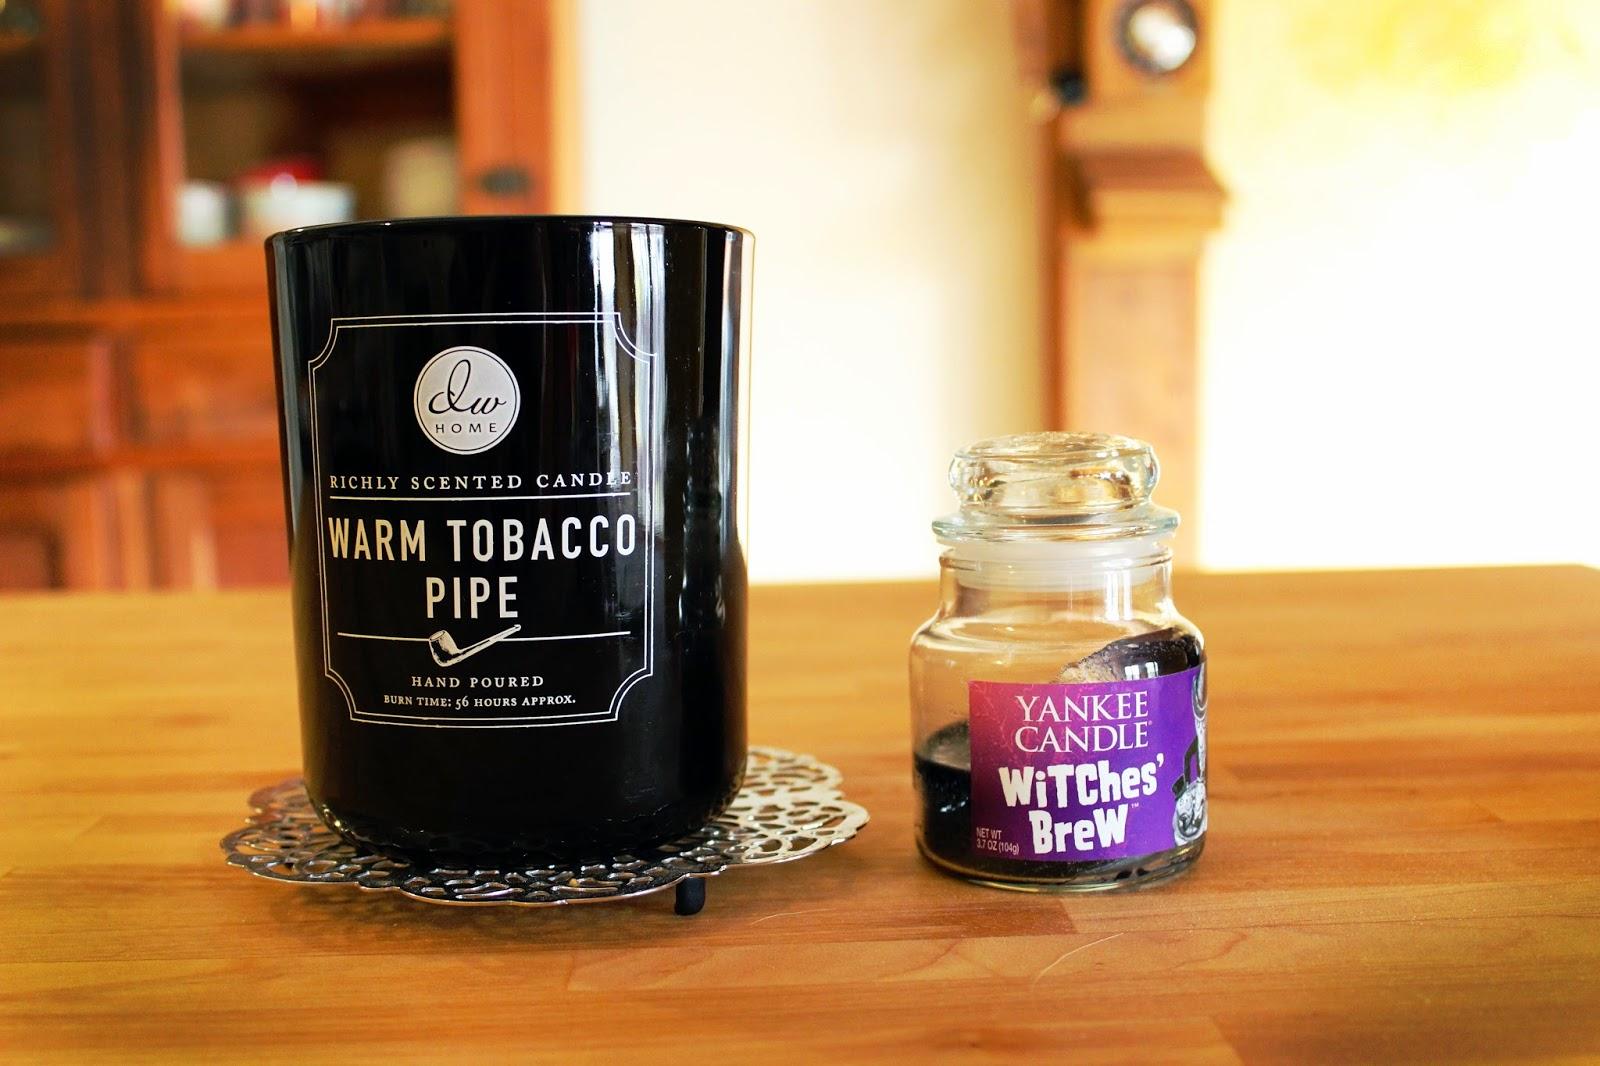 warm tobacco pipe